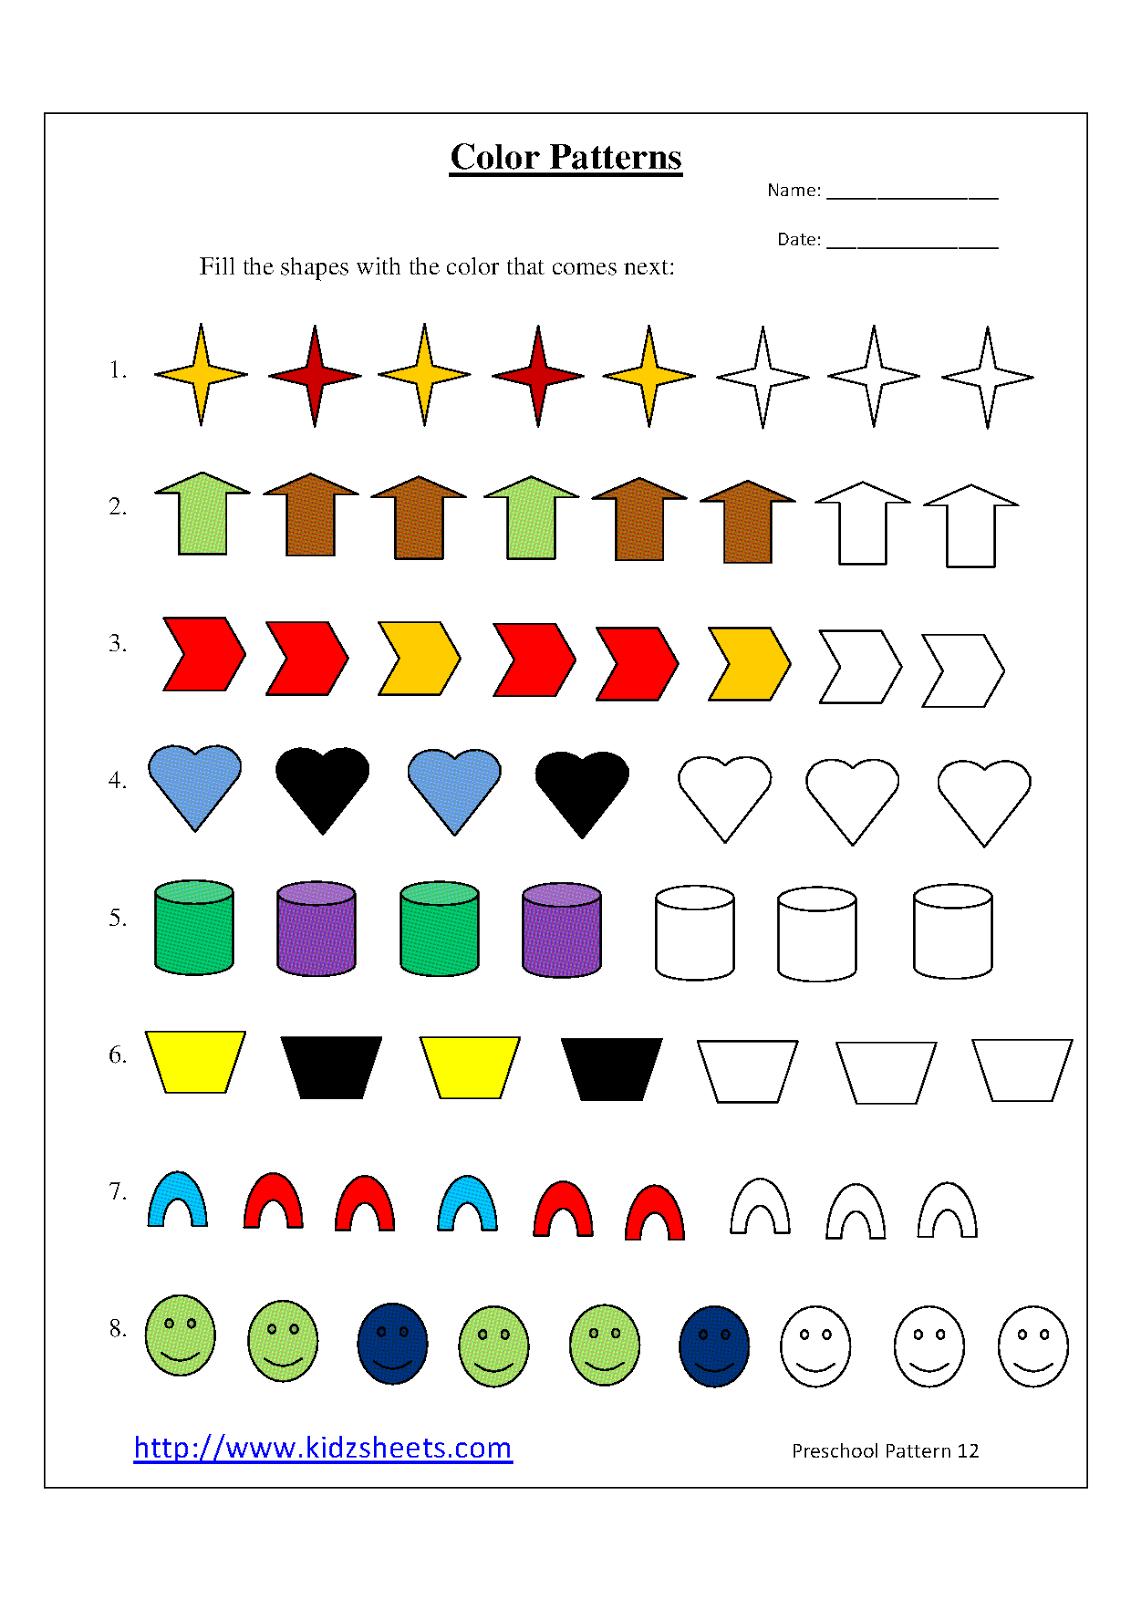 Growing Patterns Worksheet First Grade